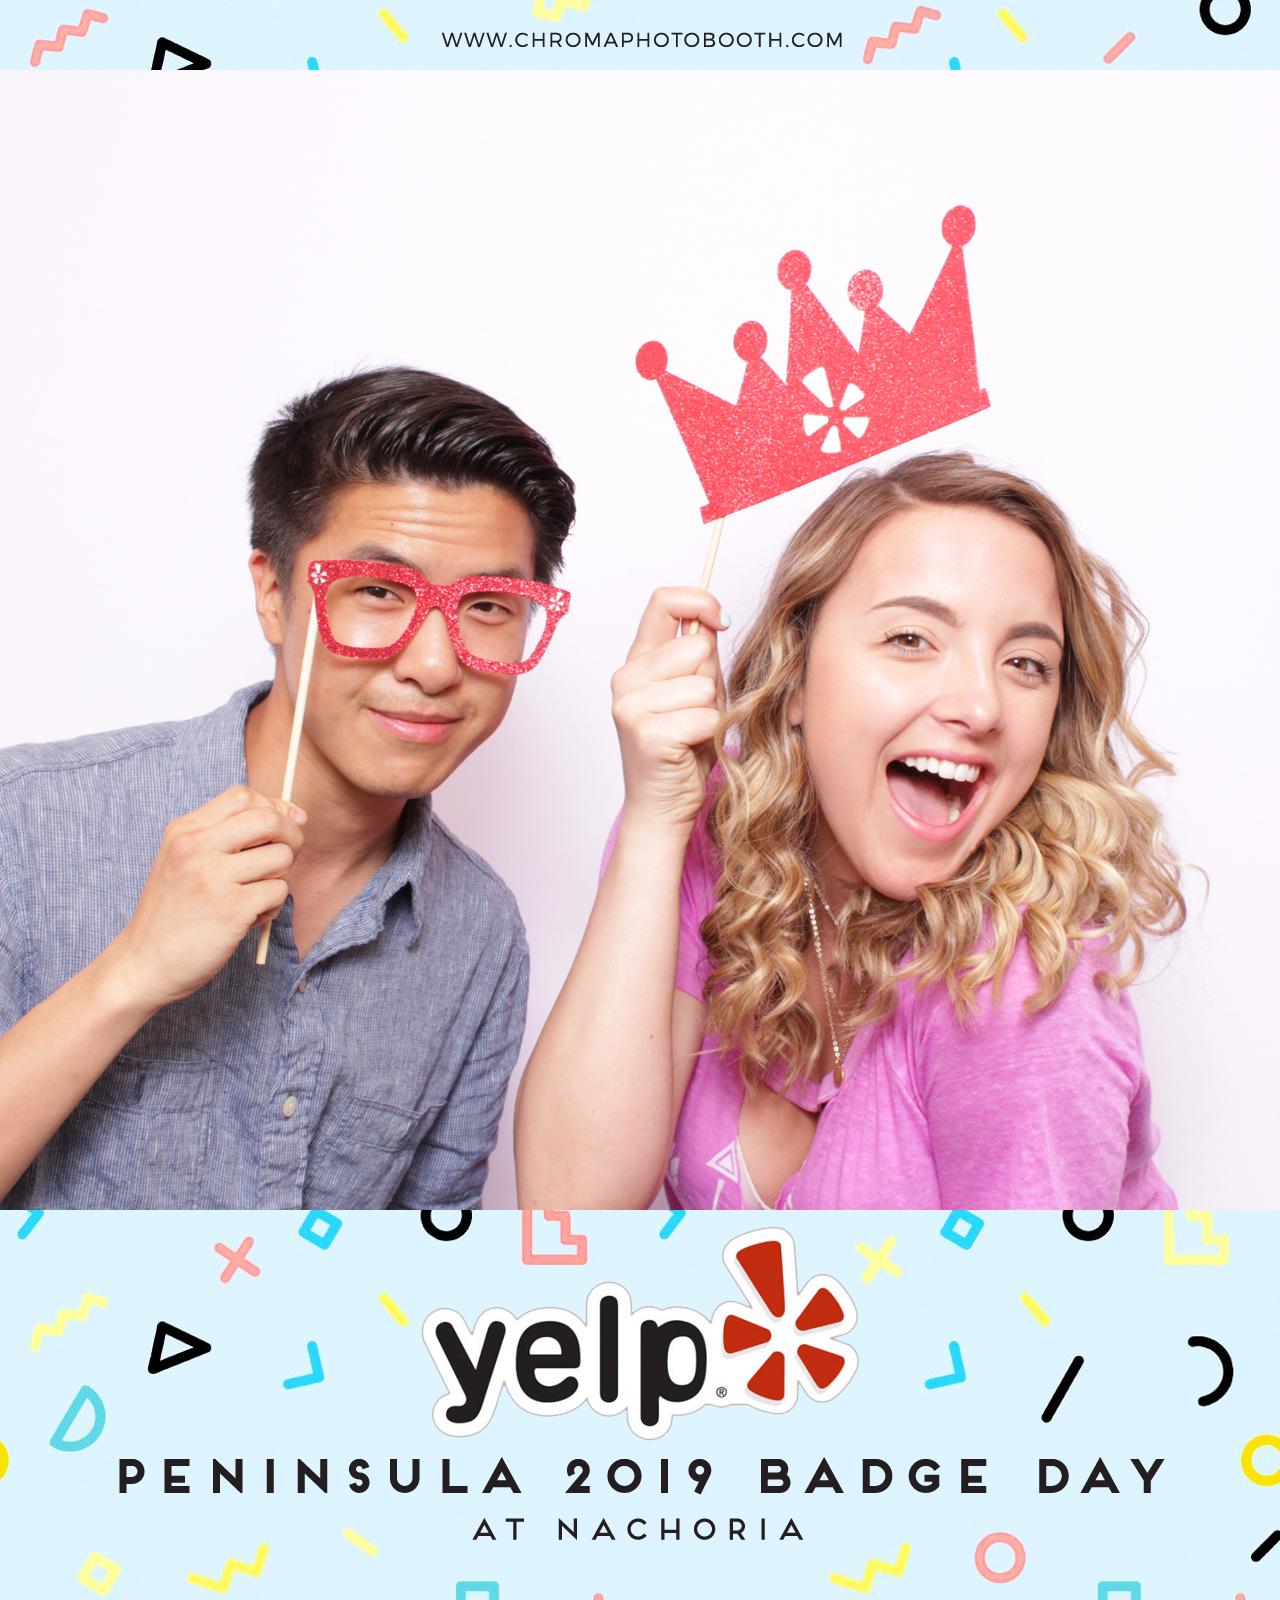 Chroma Photobooth - Yelp